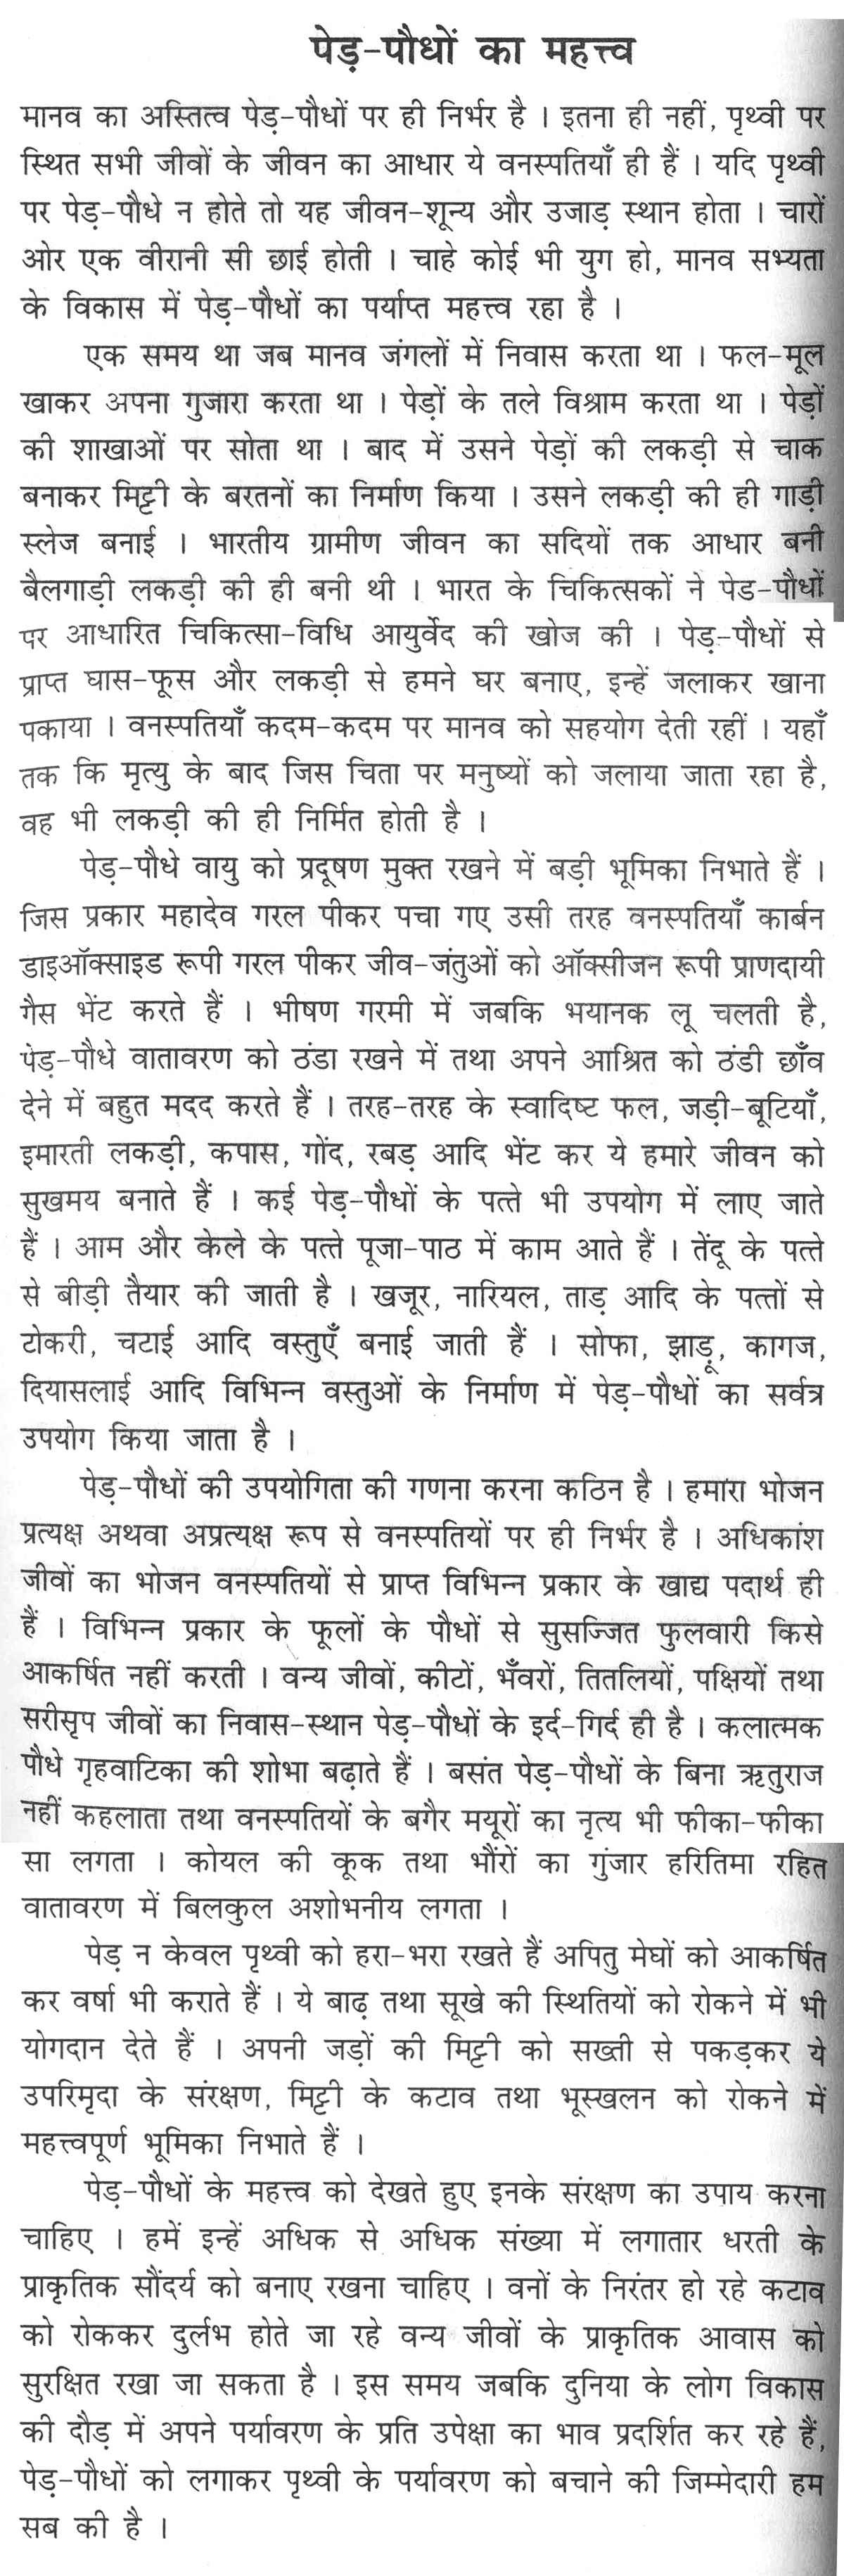 001 Voting Important Essay Thumb Importance Of In Punjabi Essays Kannada On The Rights India Pdf Tamil English Hindi Persuasive Unforgettable Marathi Full